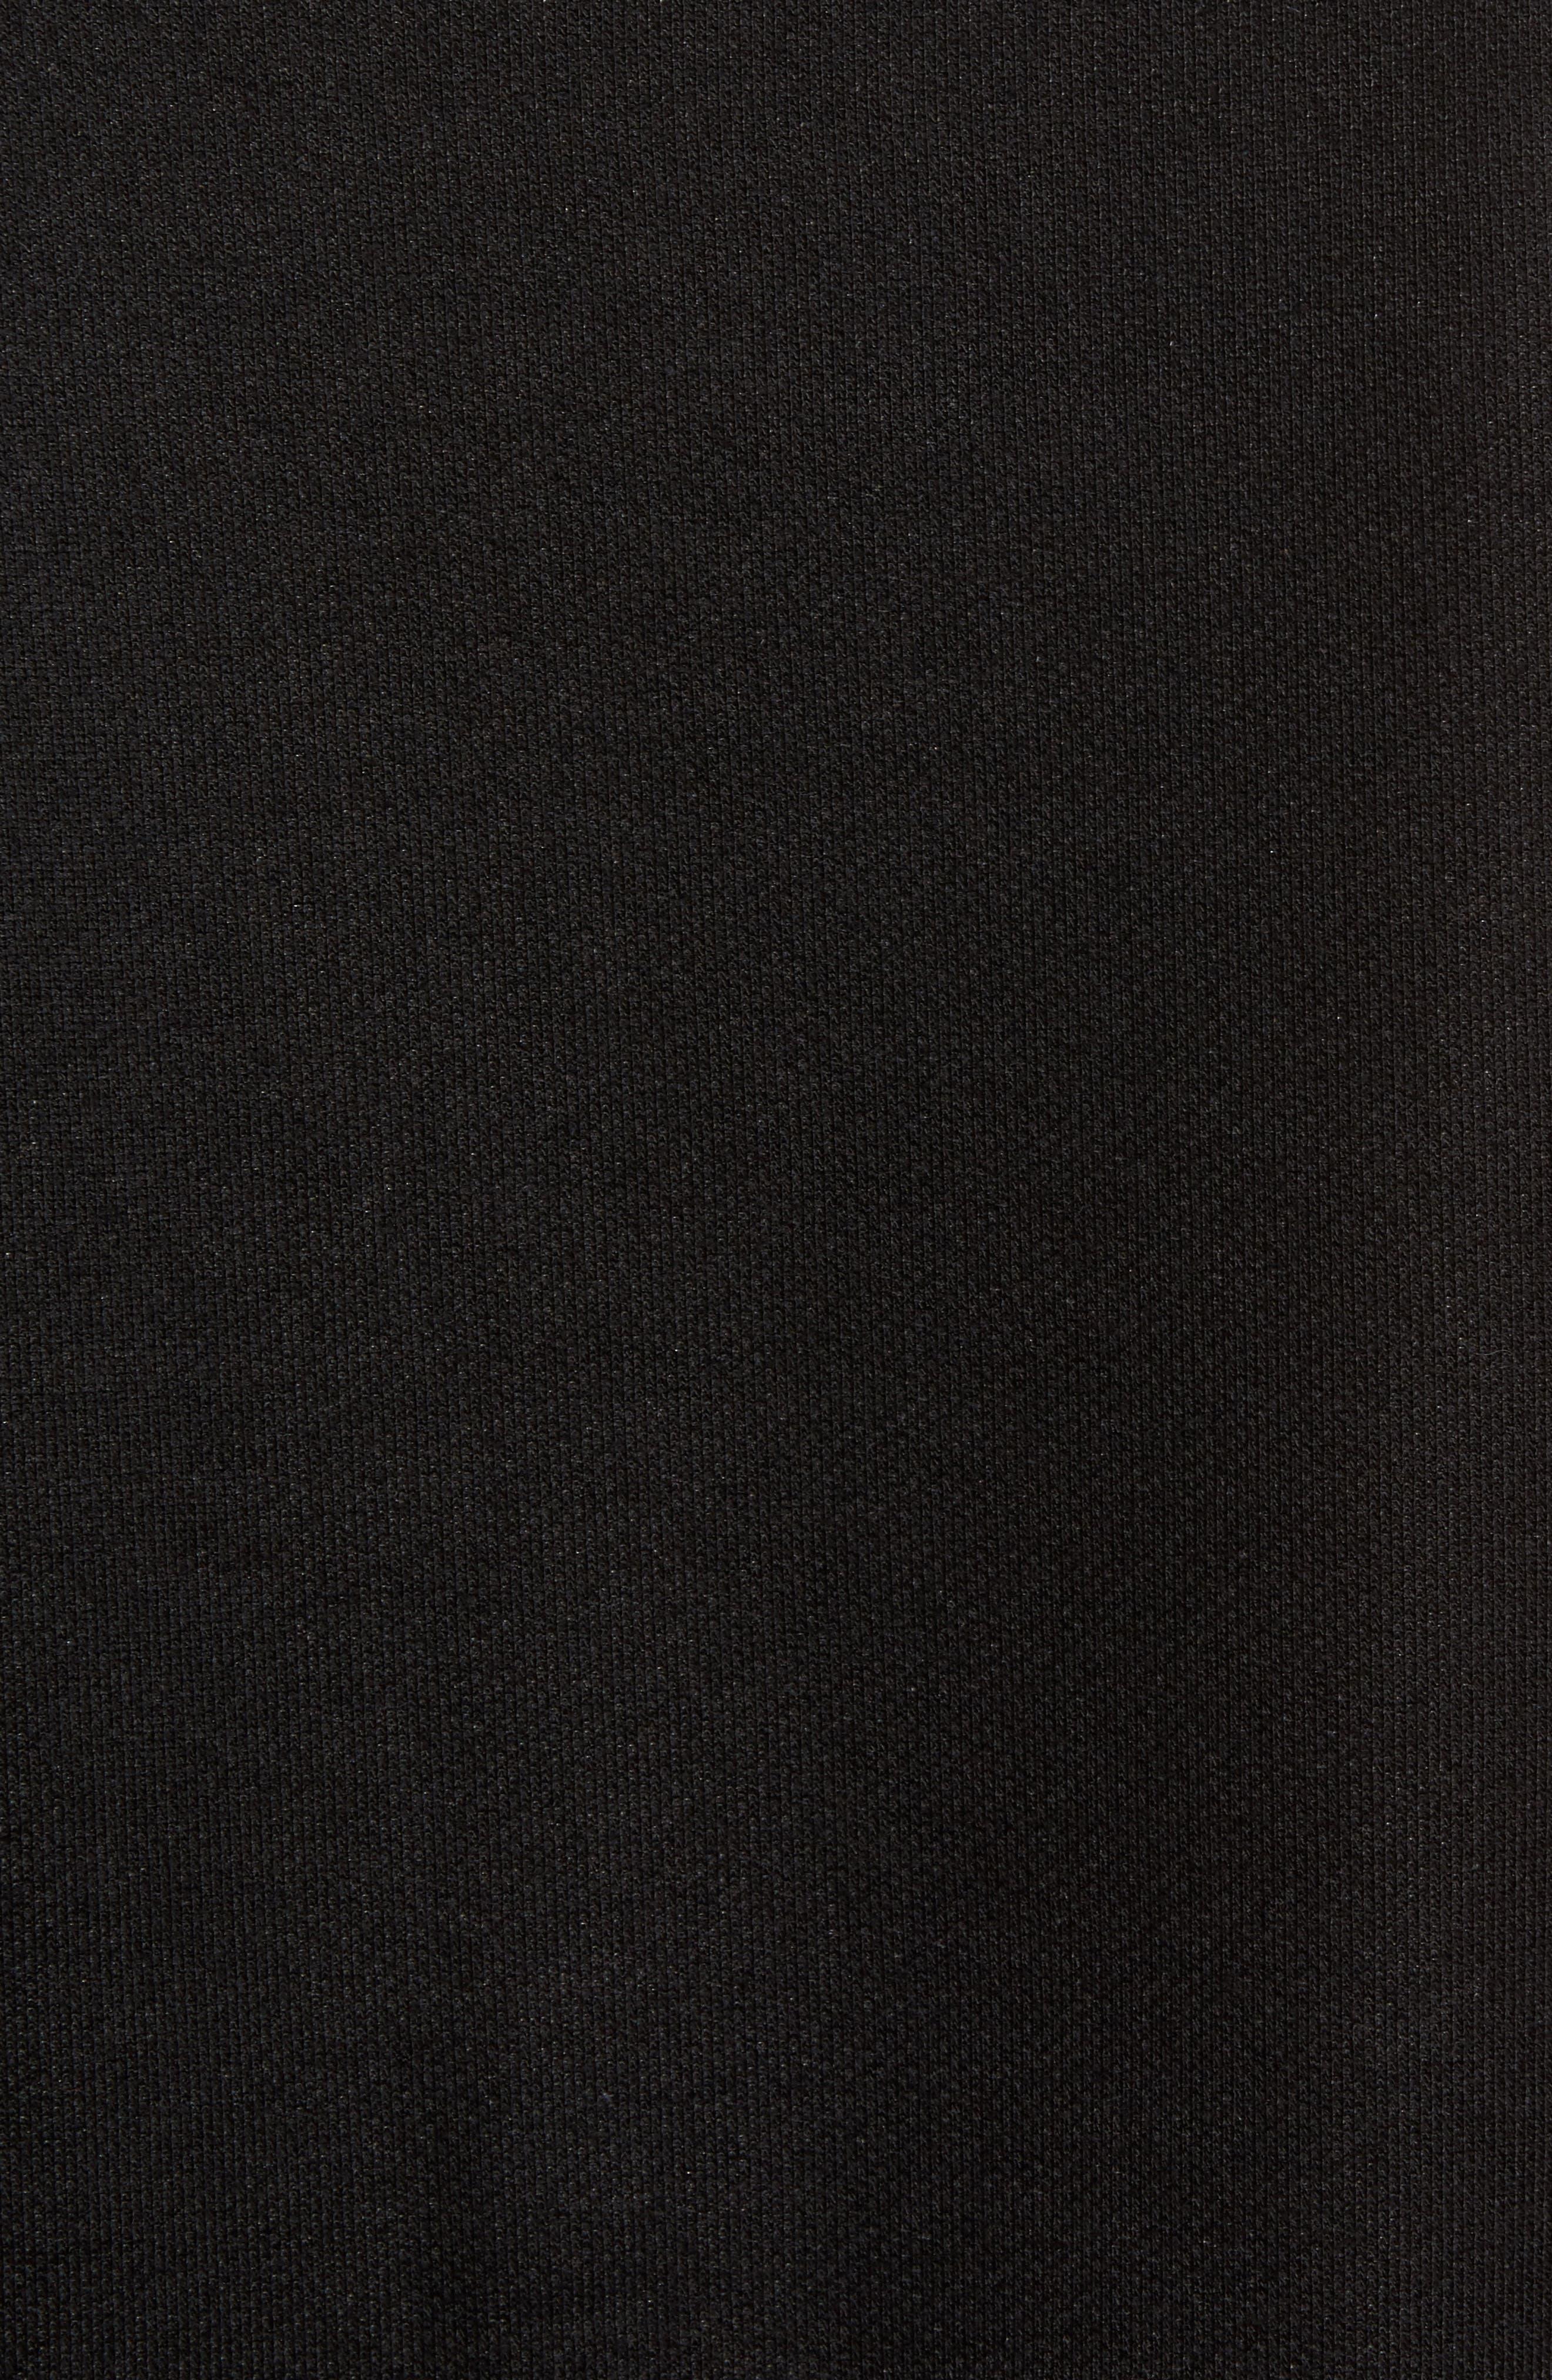 Dosha Relaxed Fit Sweatshirt Tank,                             Alternate thumbnail 5, color,                             BLACK